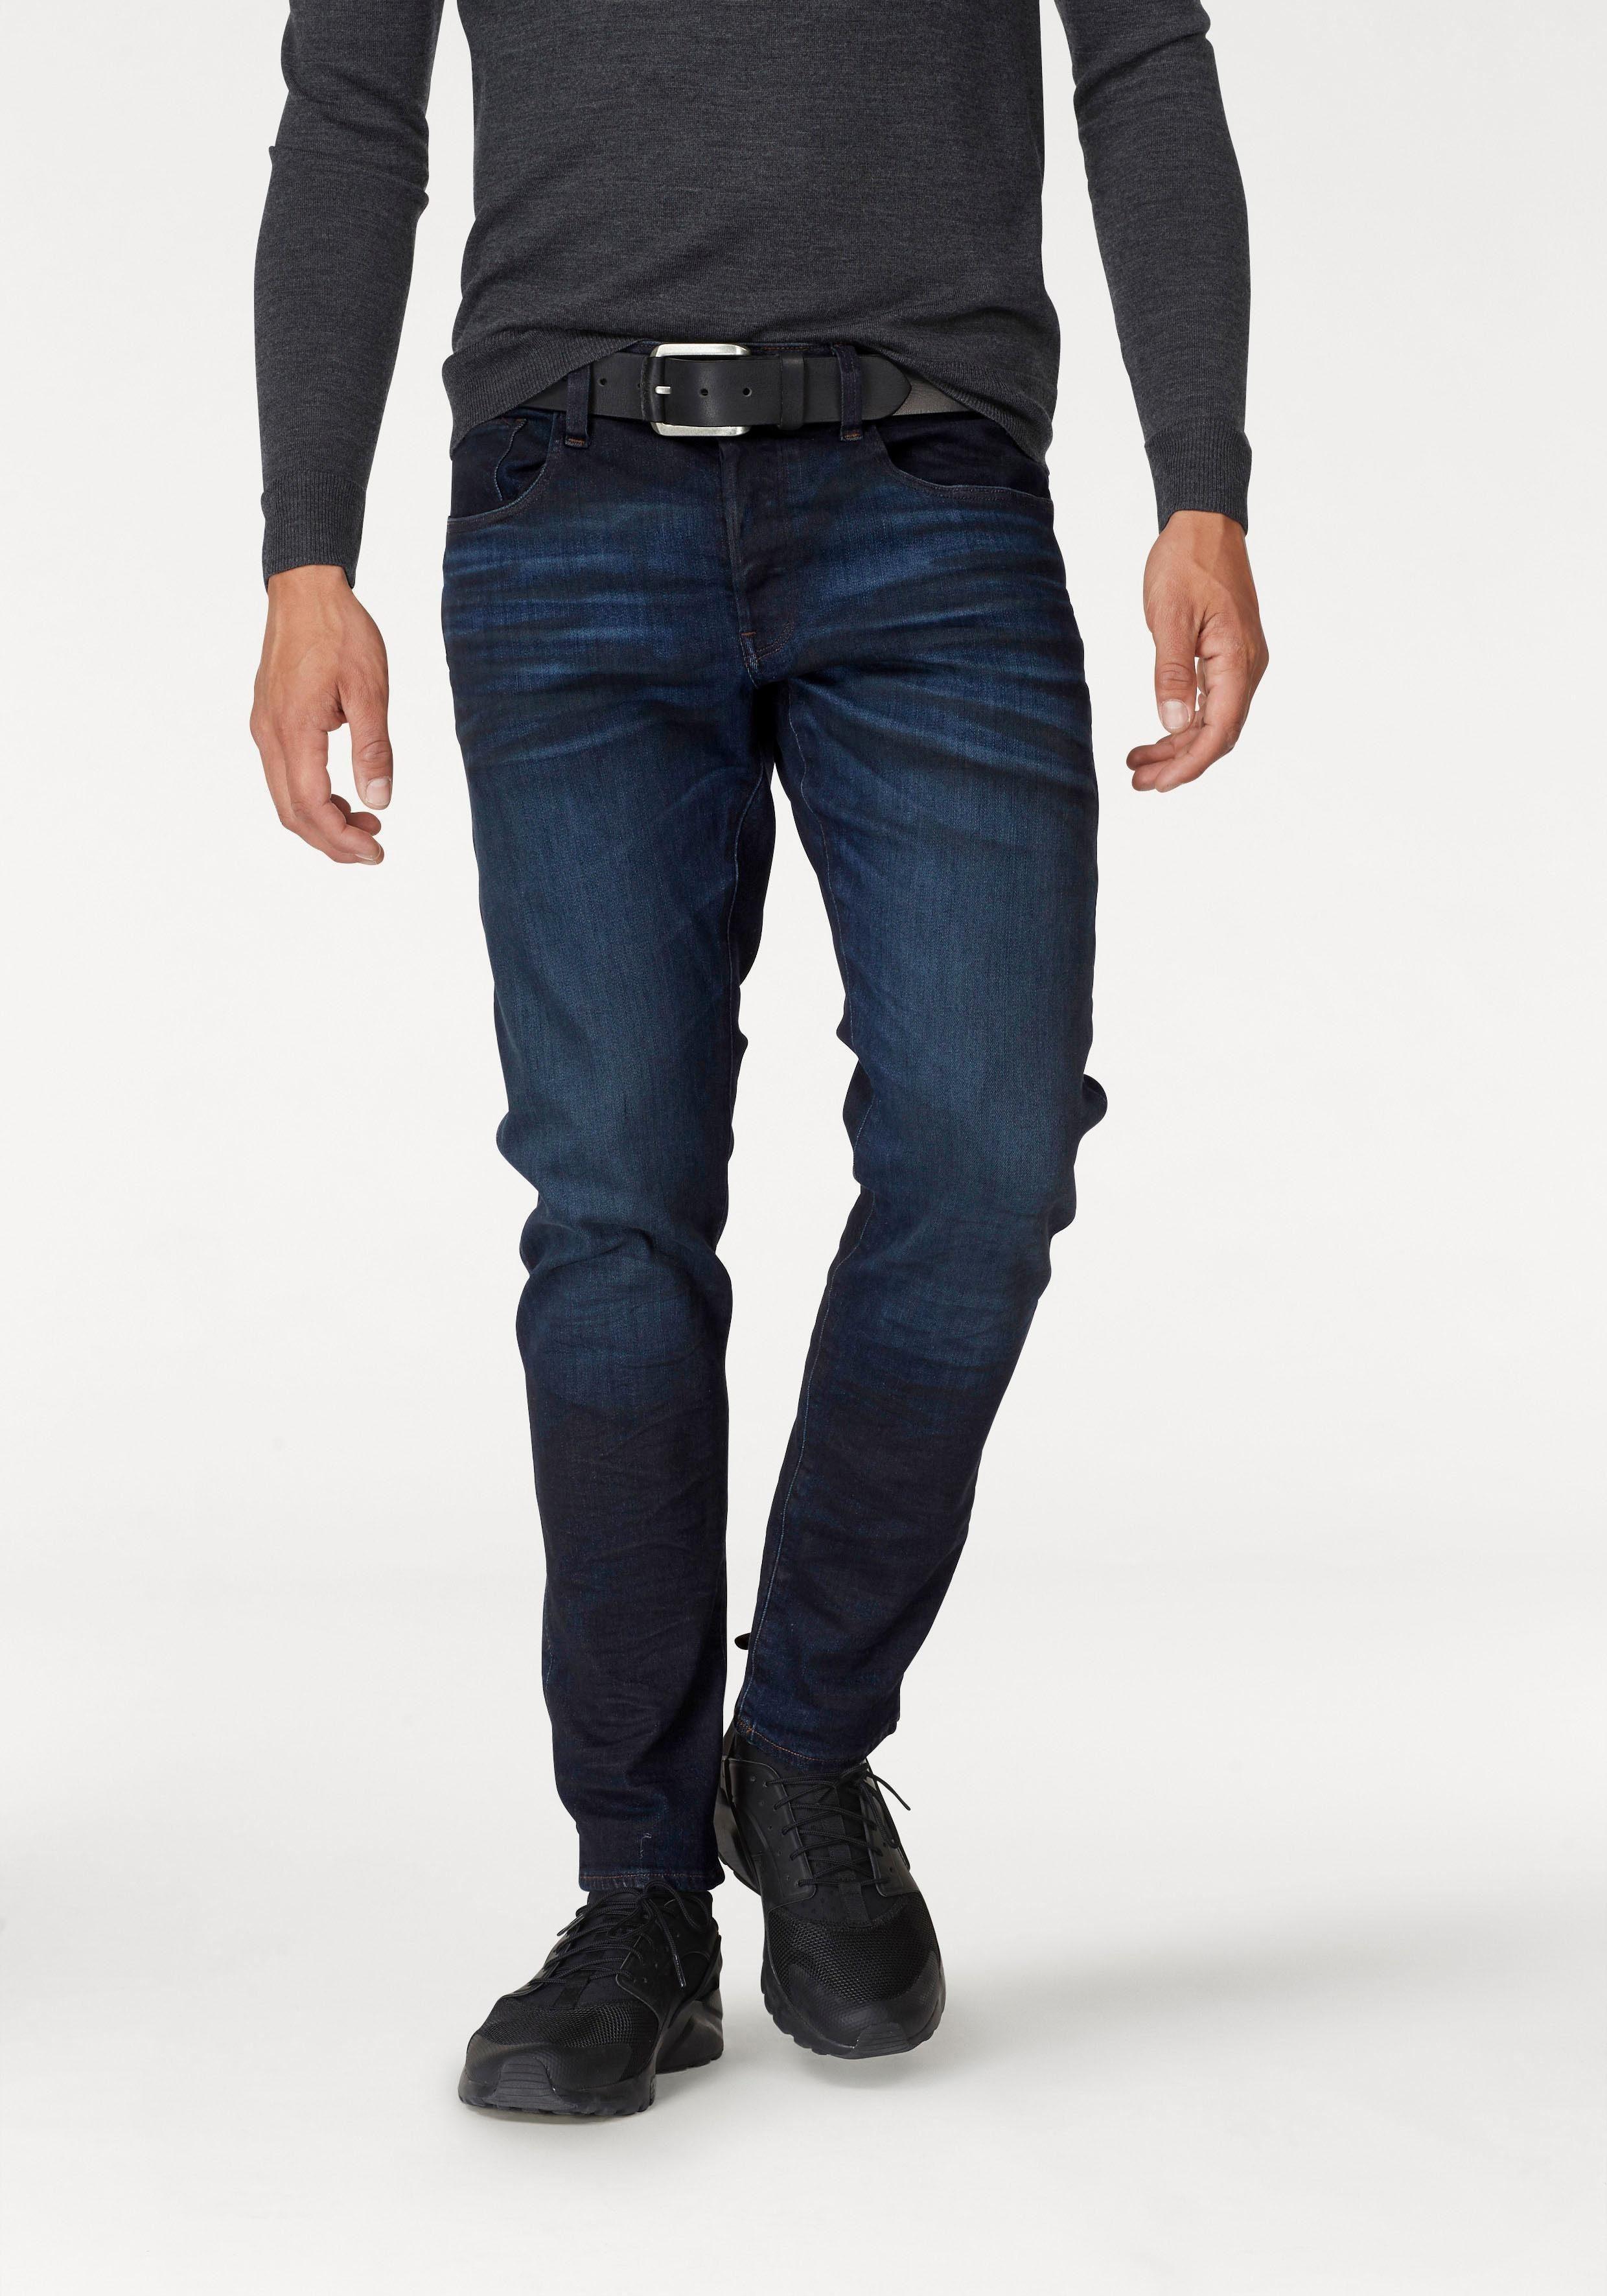 G-Star RAW Slim-fit-Jeans »3301 Deconstructed Slim«